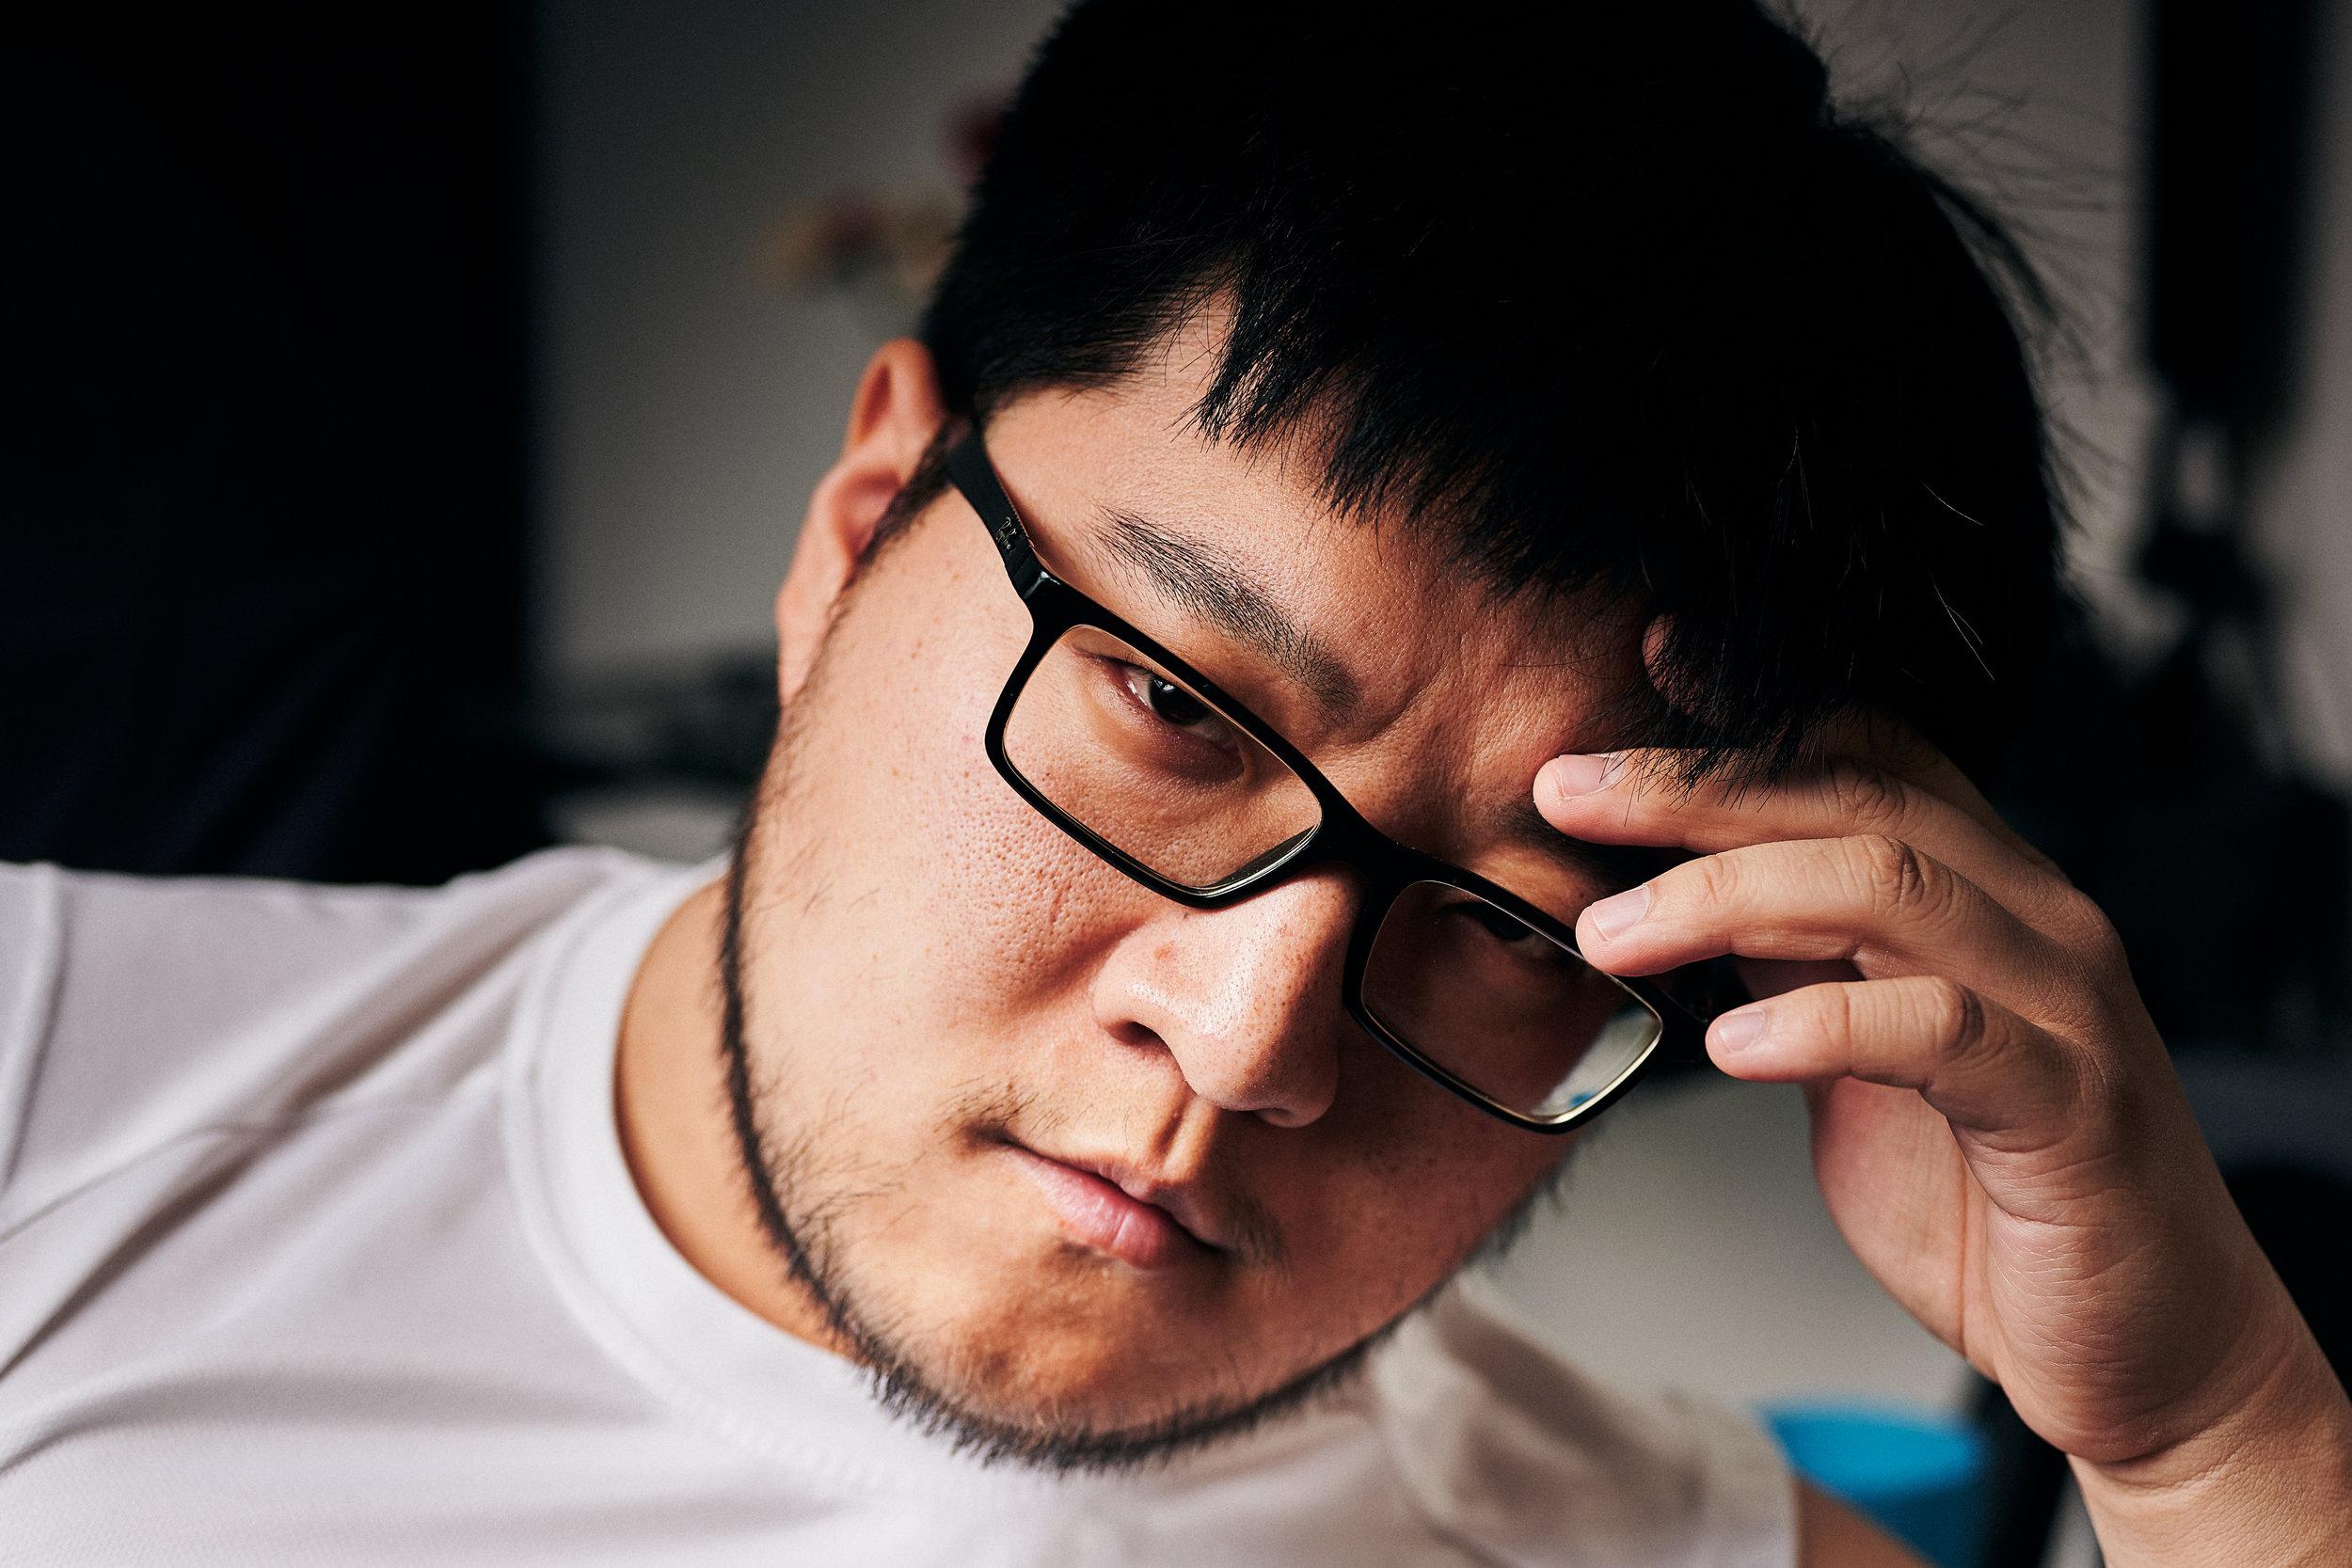 ©2019 Michael Jin. Self portrait.